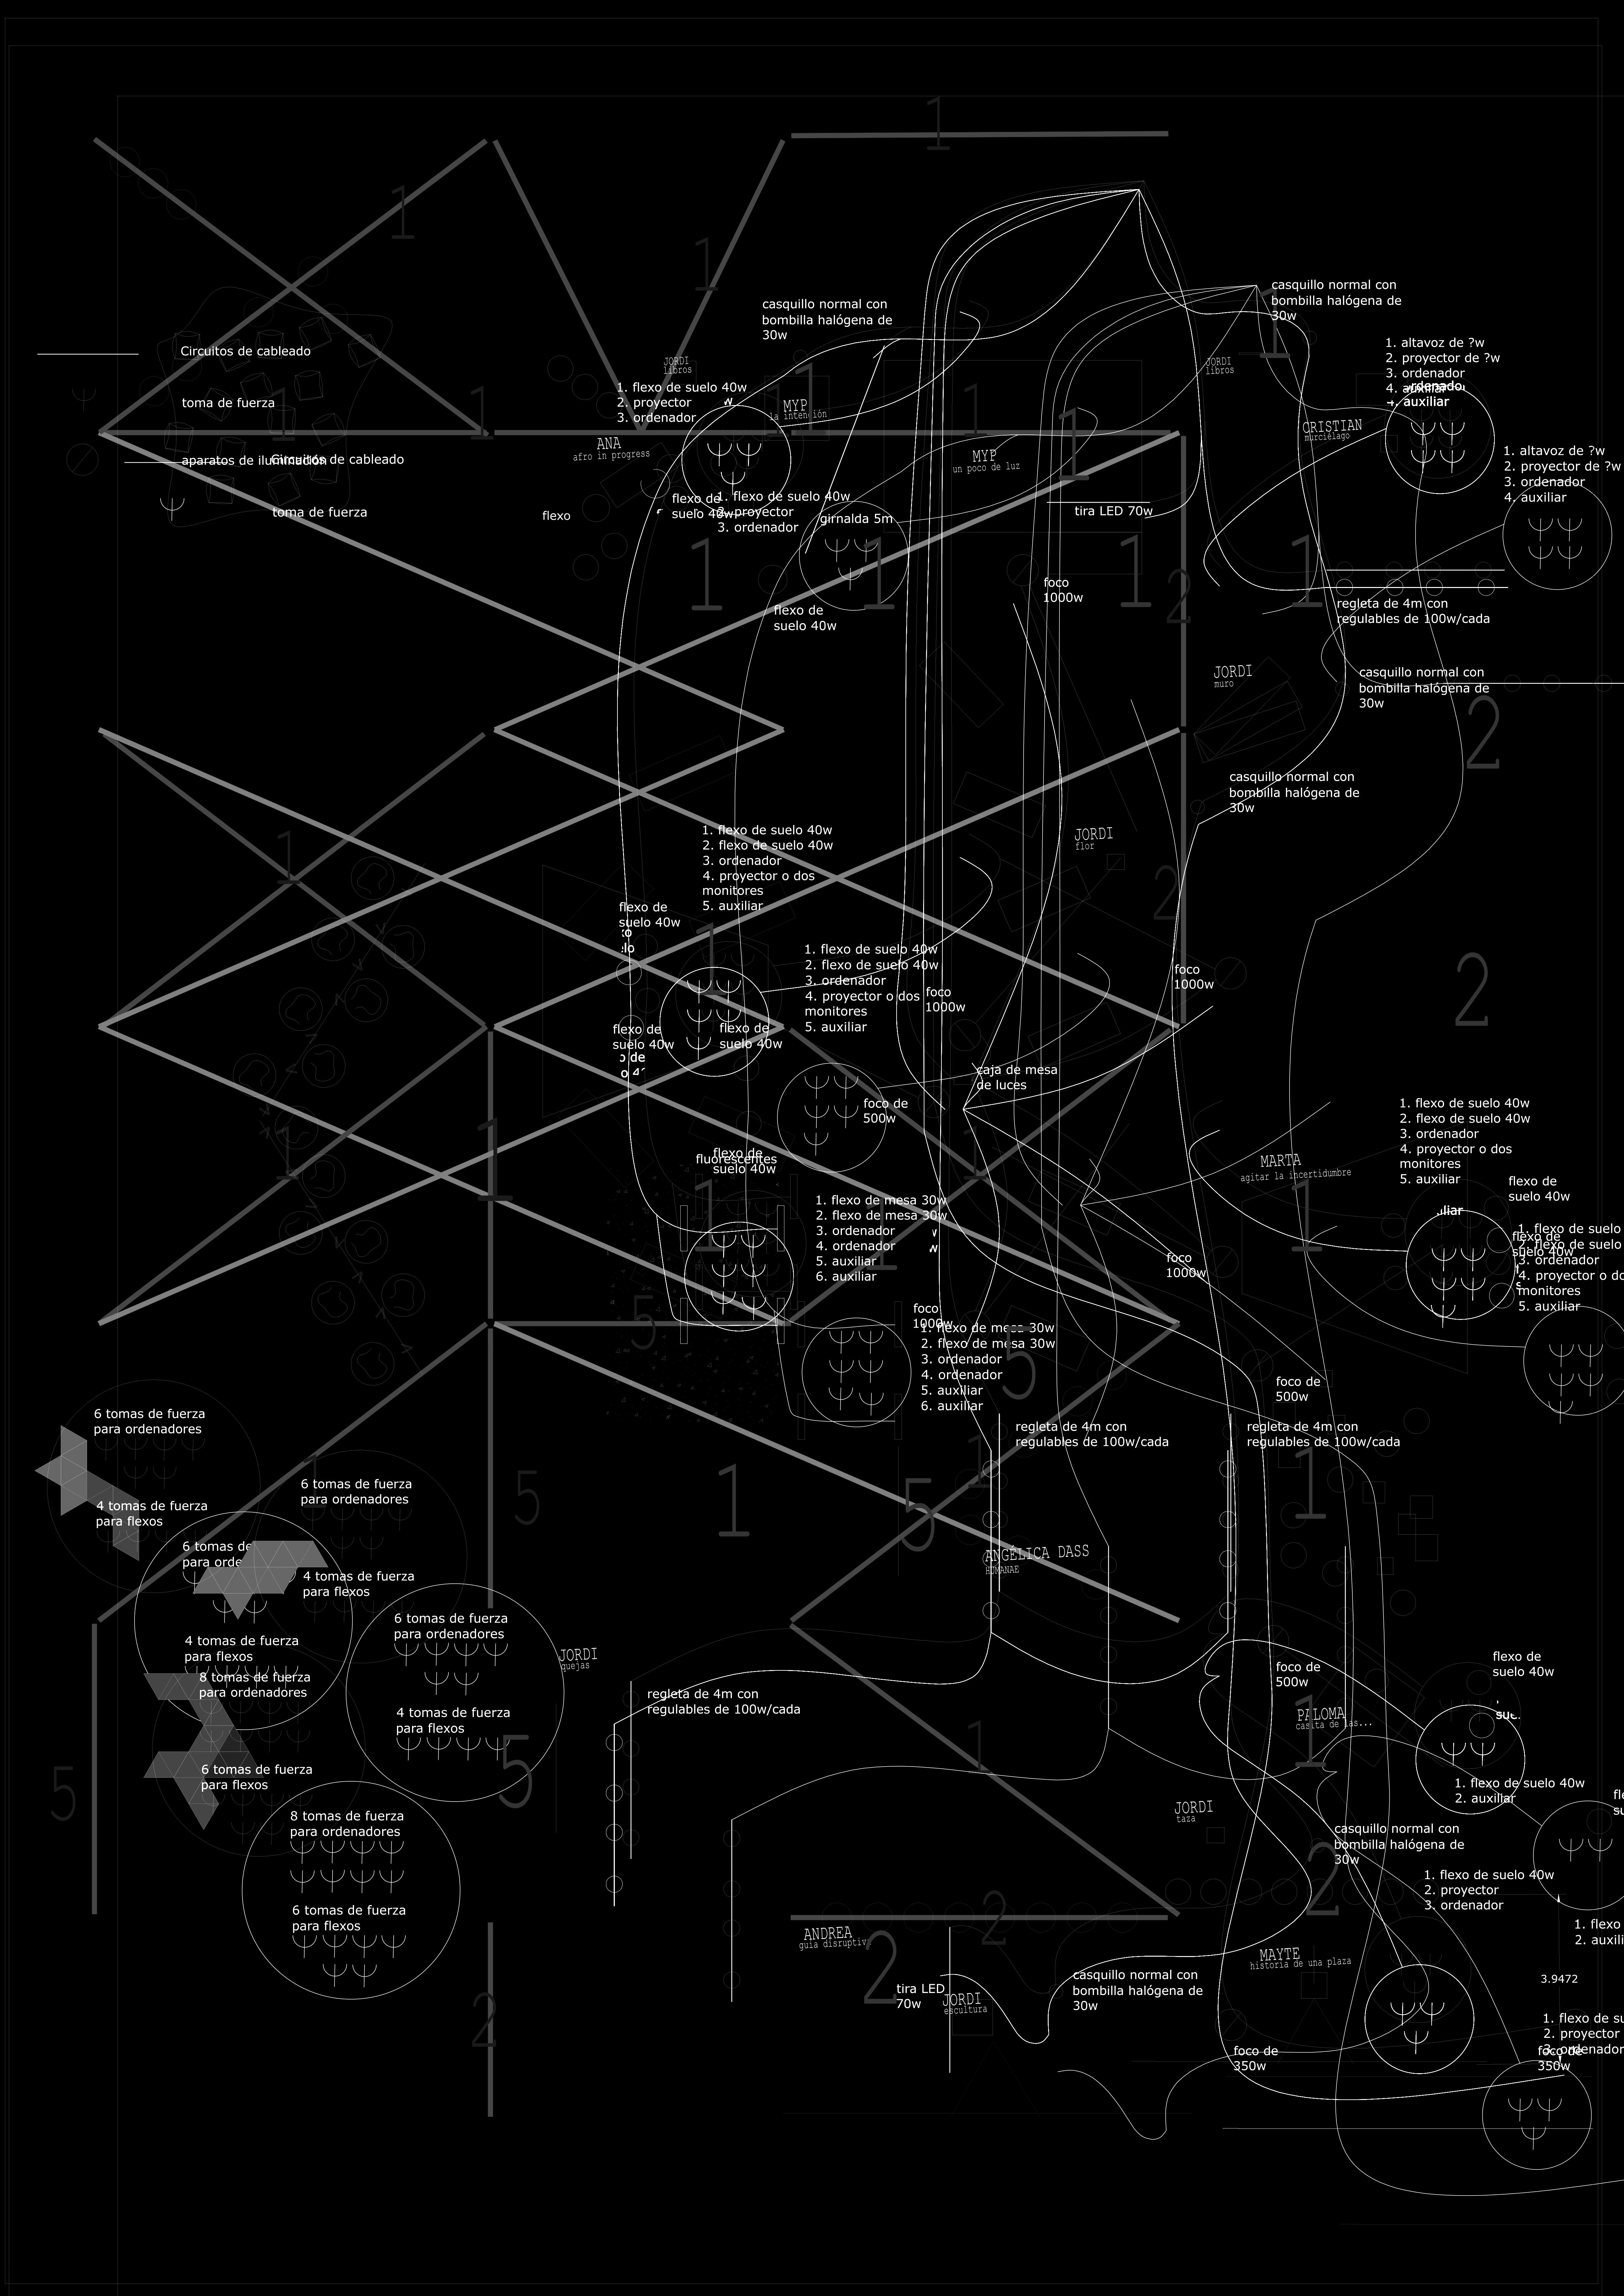 Madstock/pedagogias/150926 plano nueva nave.dwg